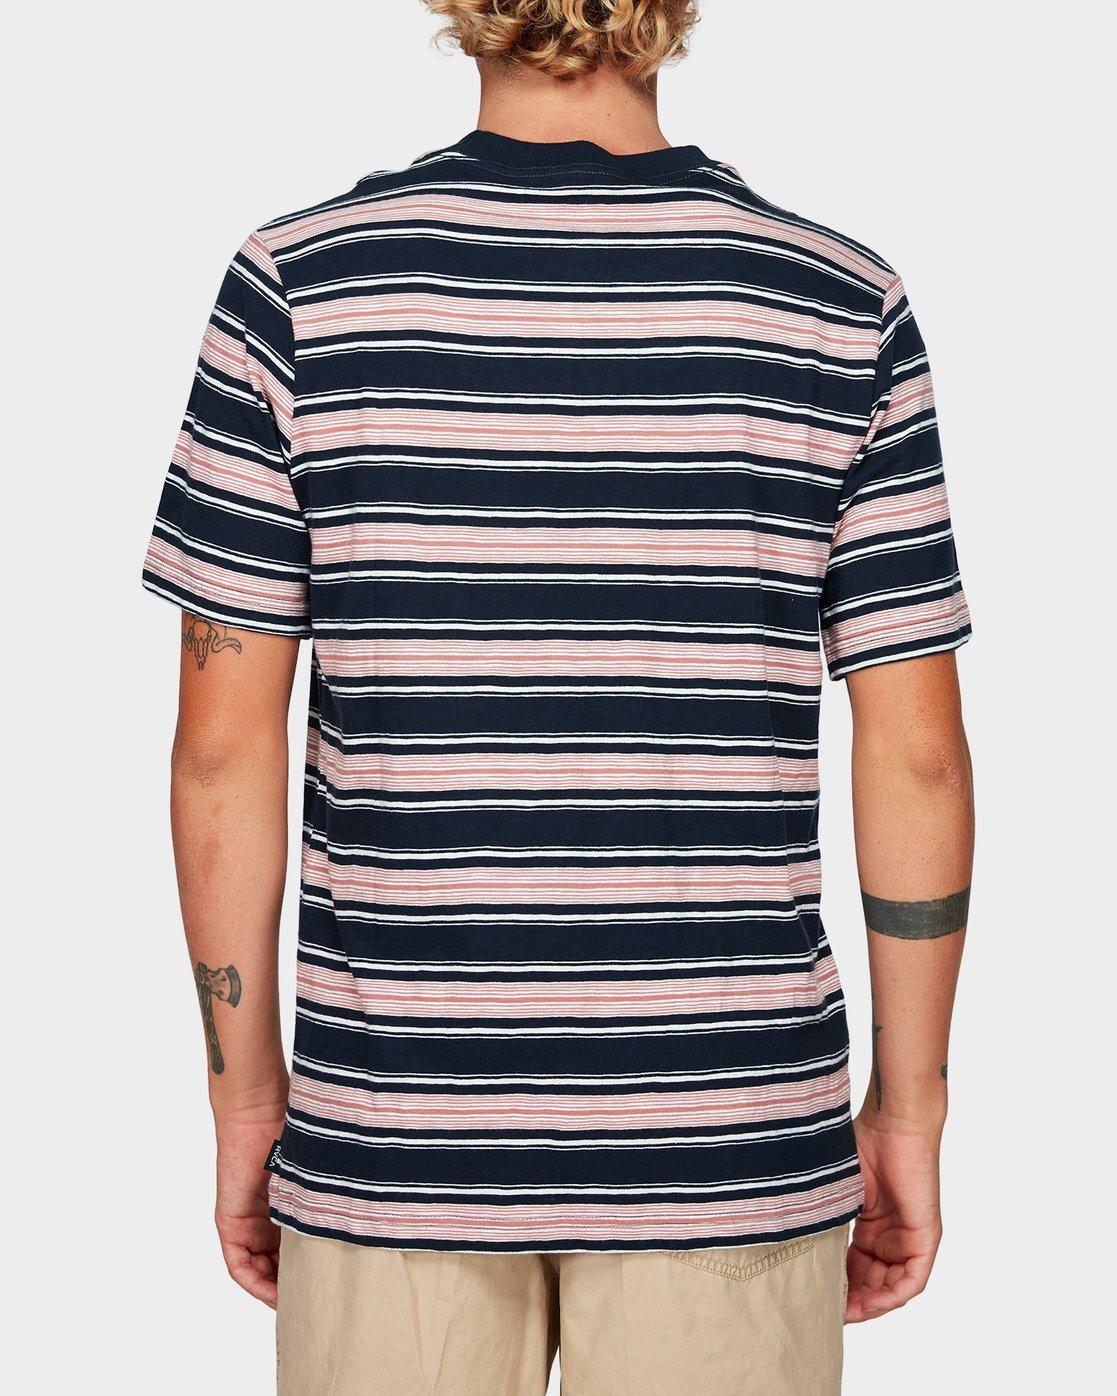 2 Hank Stripe Short Sleeve T-Shirt Blue R192063 RVCA